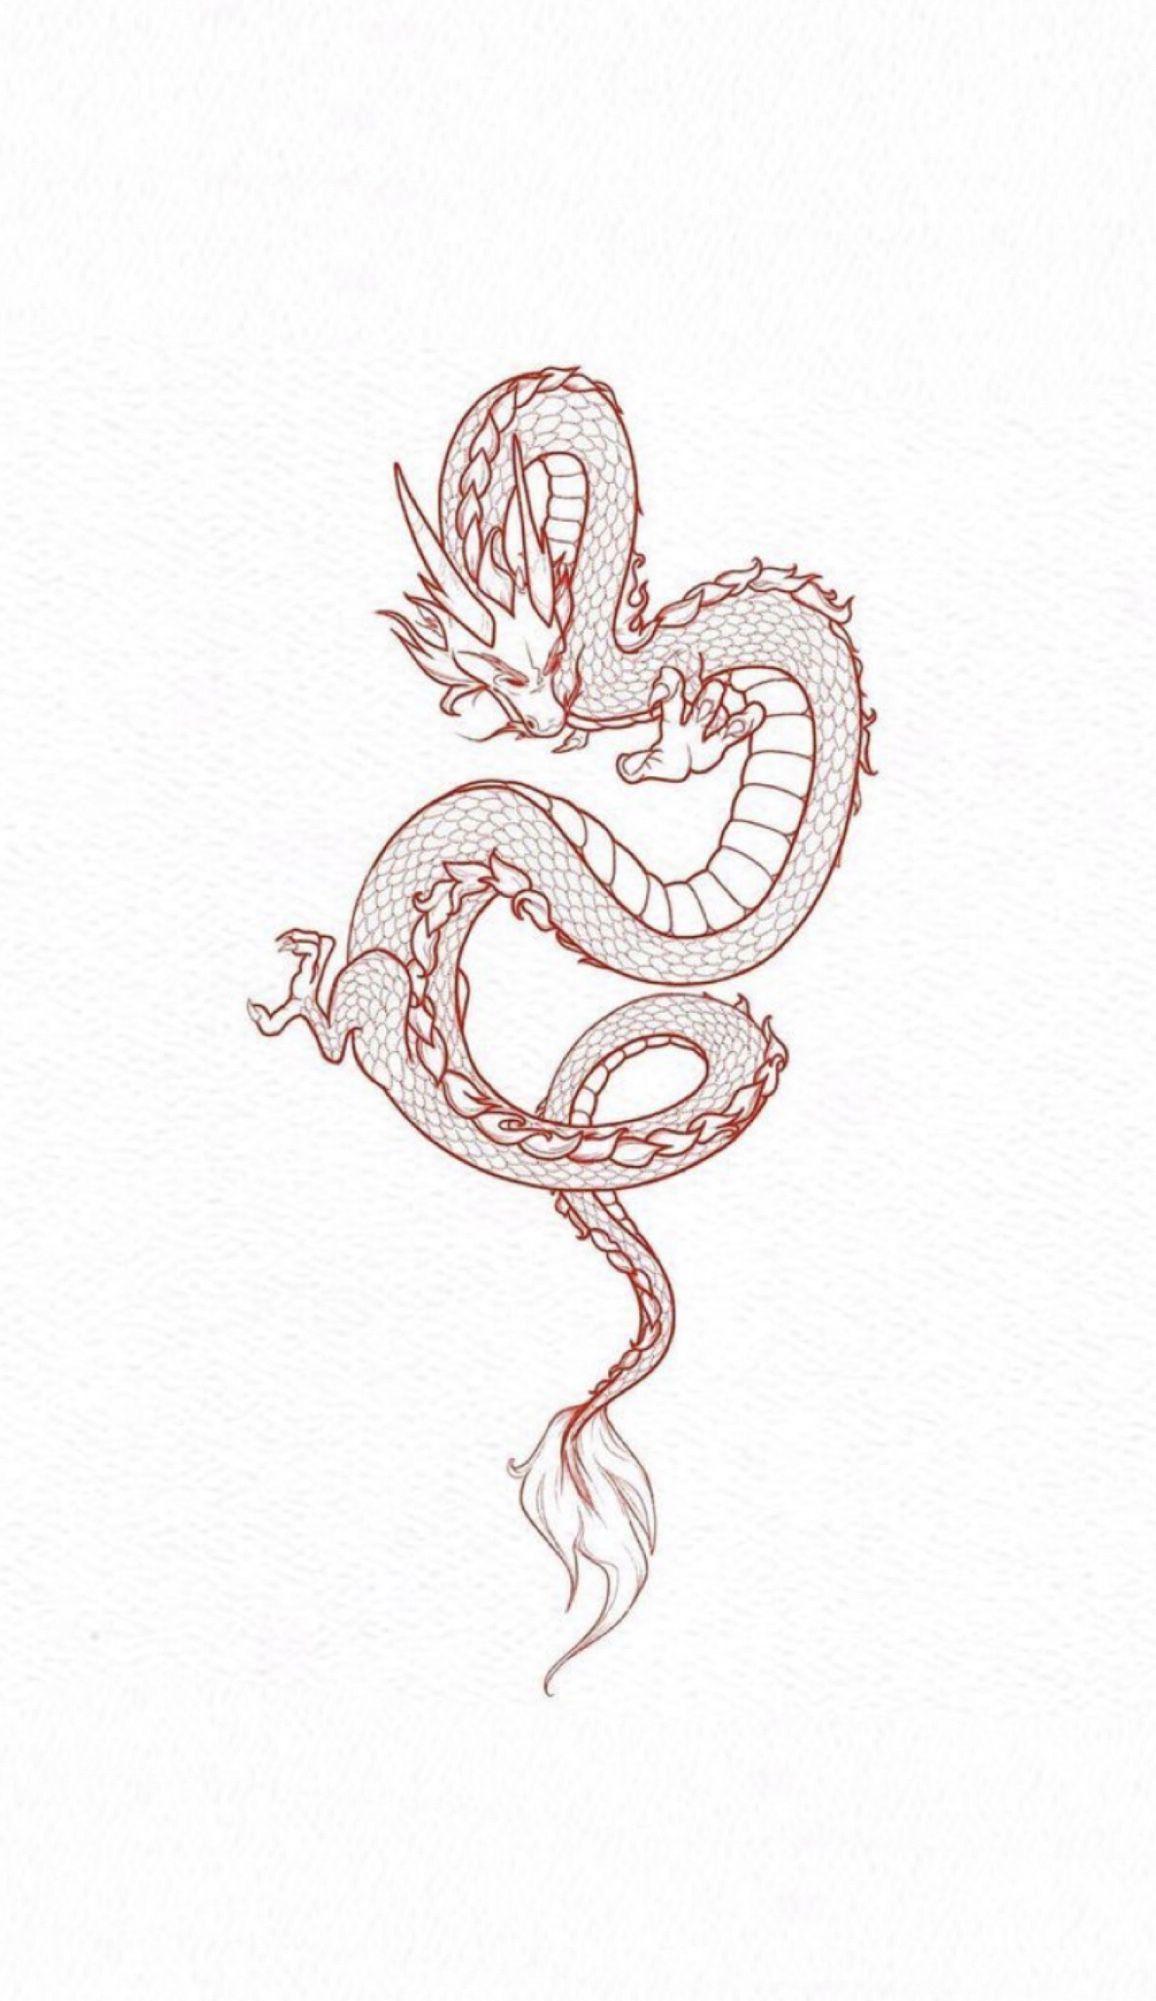 Dragon V 2020 G Izredzumi Tatuirovki Krasnye Tatuirovki Tatuirovki Kitajskogo Drakona